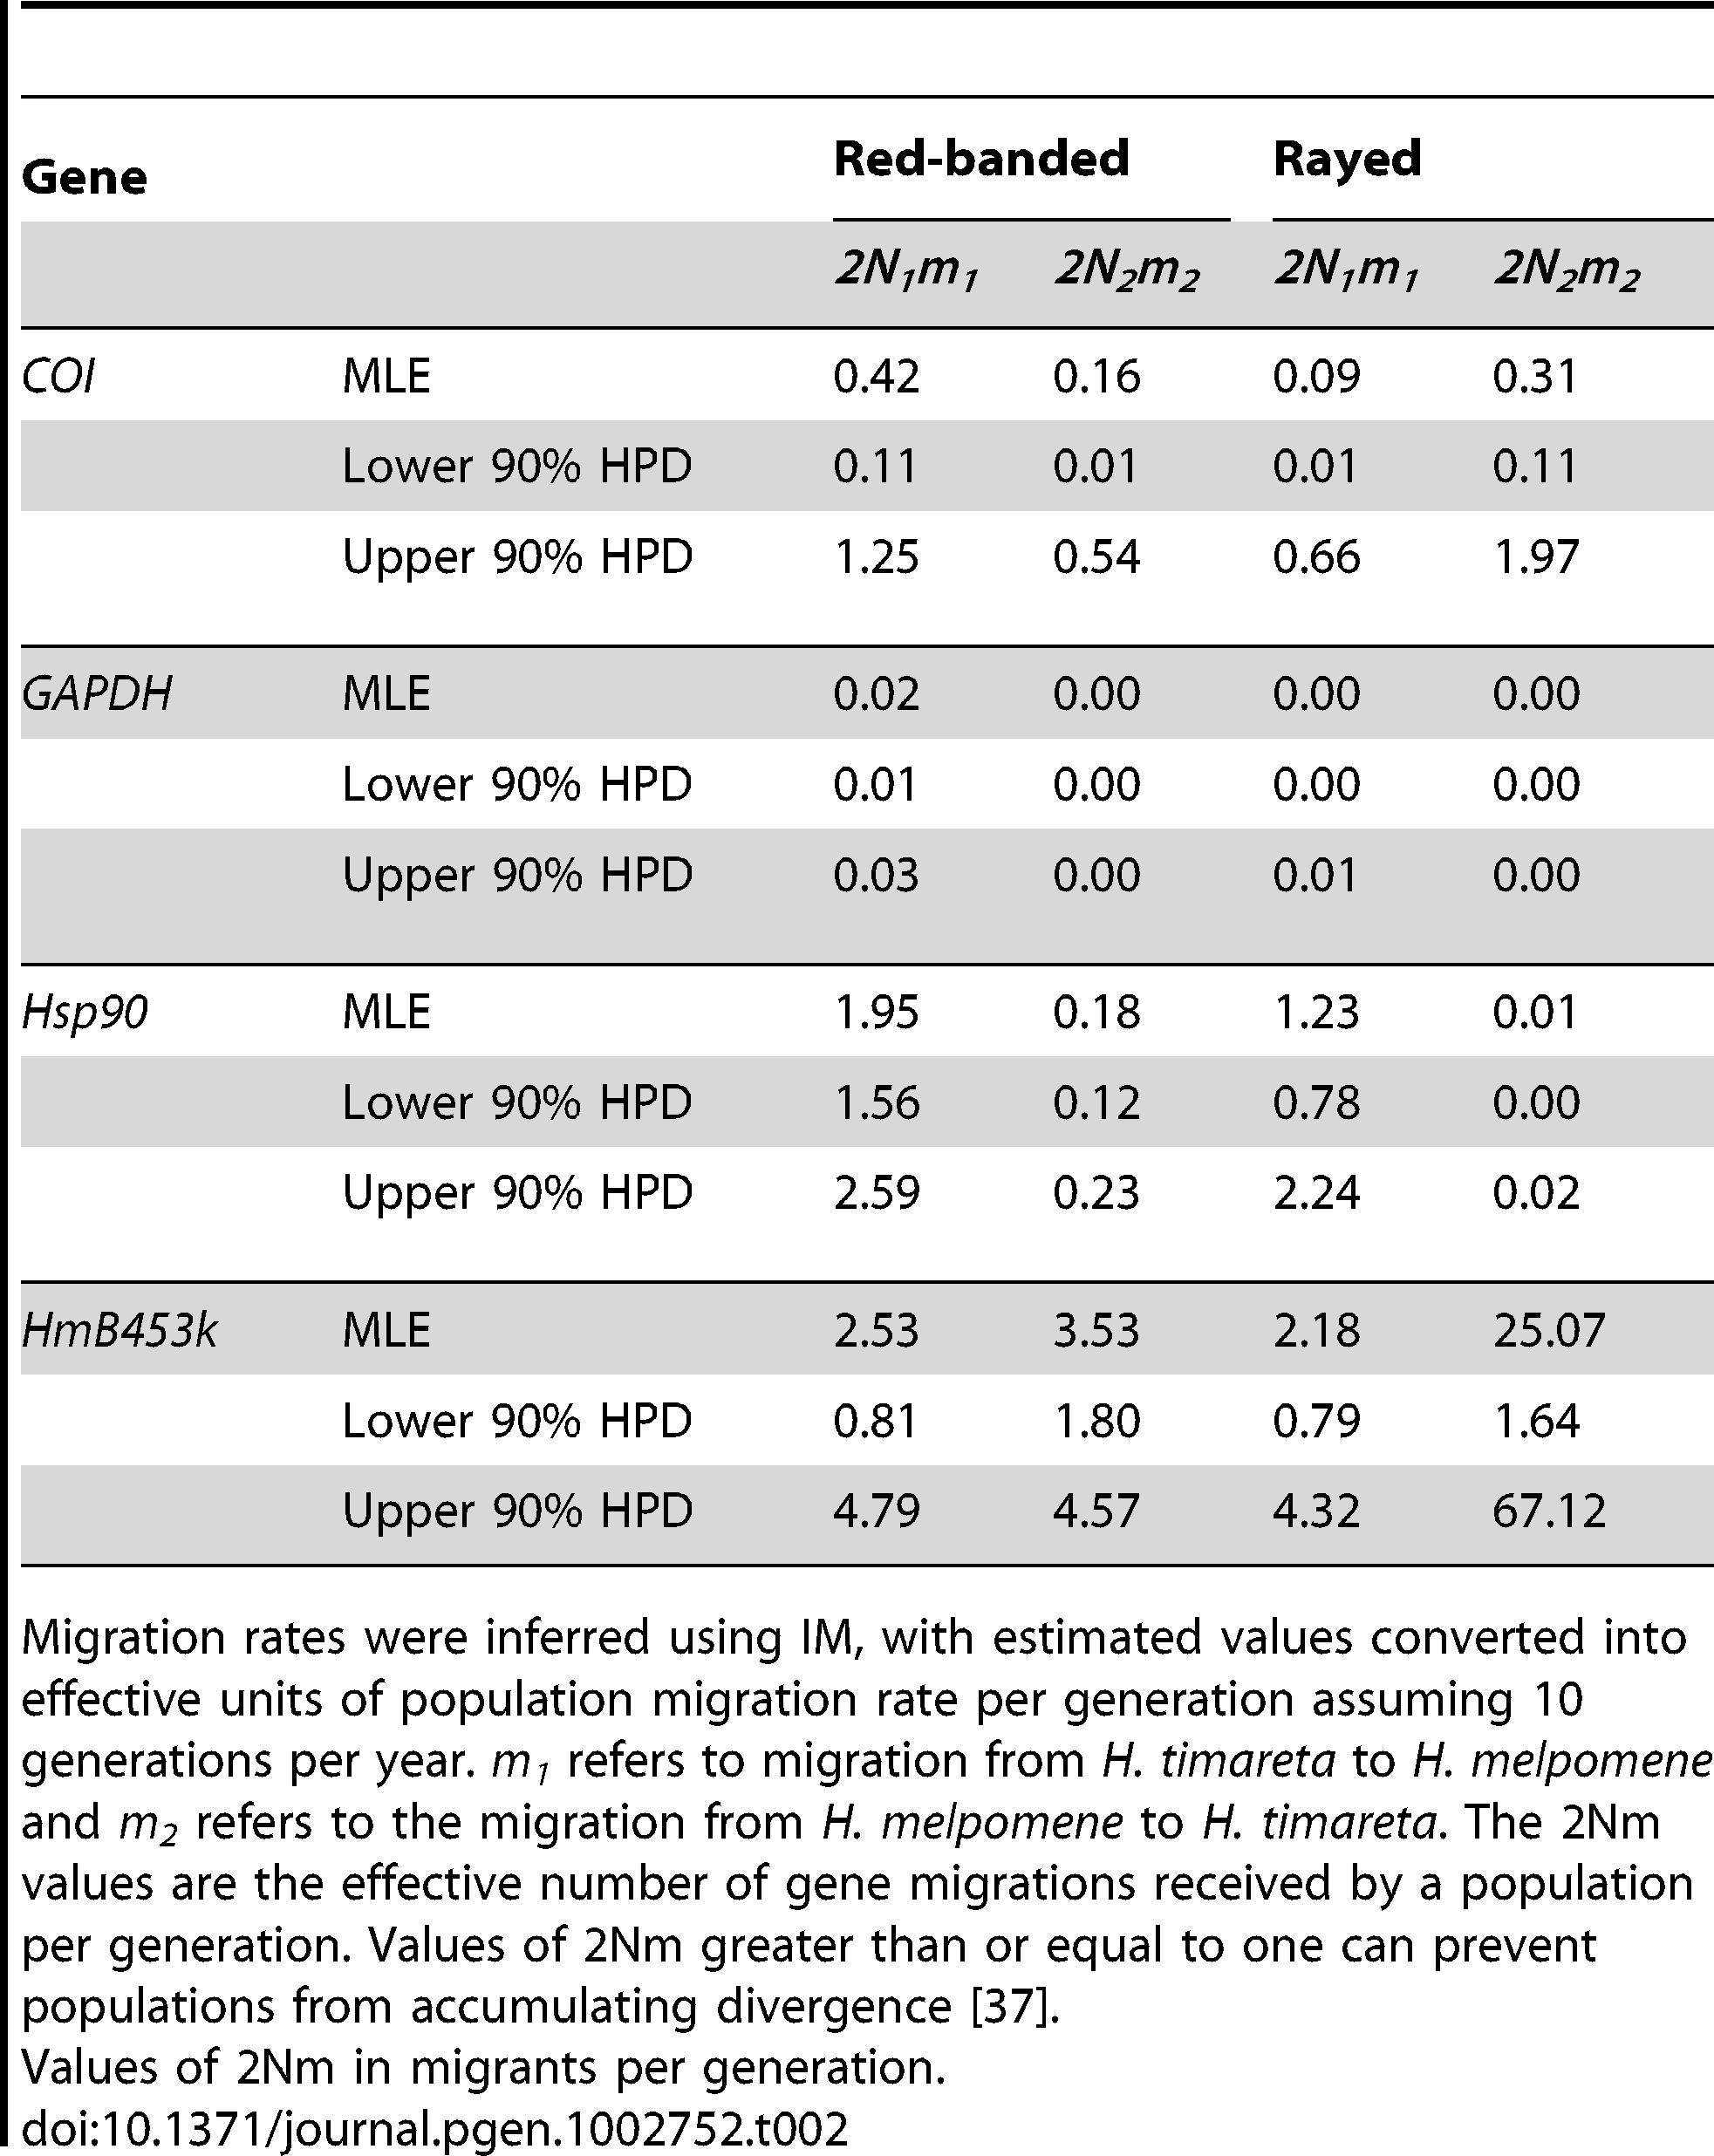 Rates of interspecies introgression between <i>H. melpomene</i>, <i>H. heurippa</i>, and <i>H. timareta</i>.